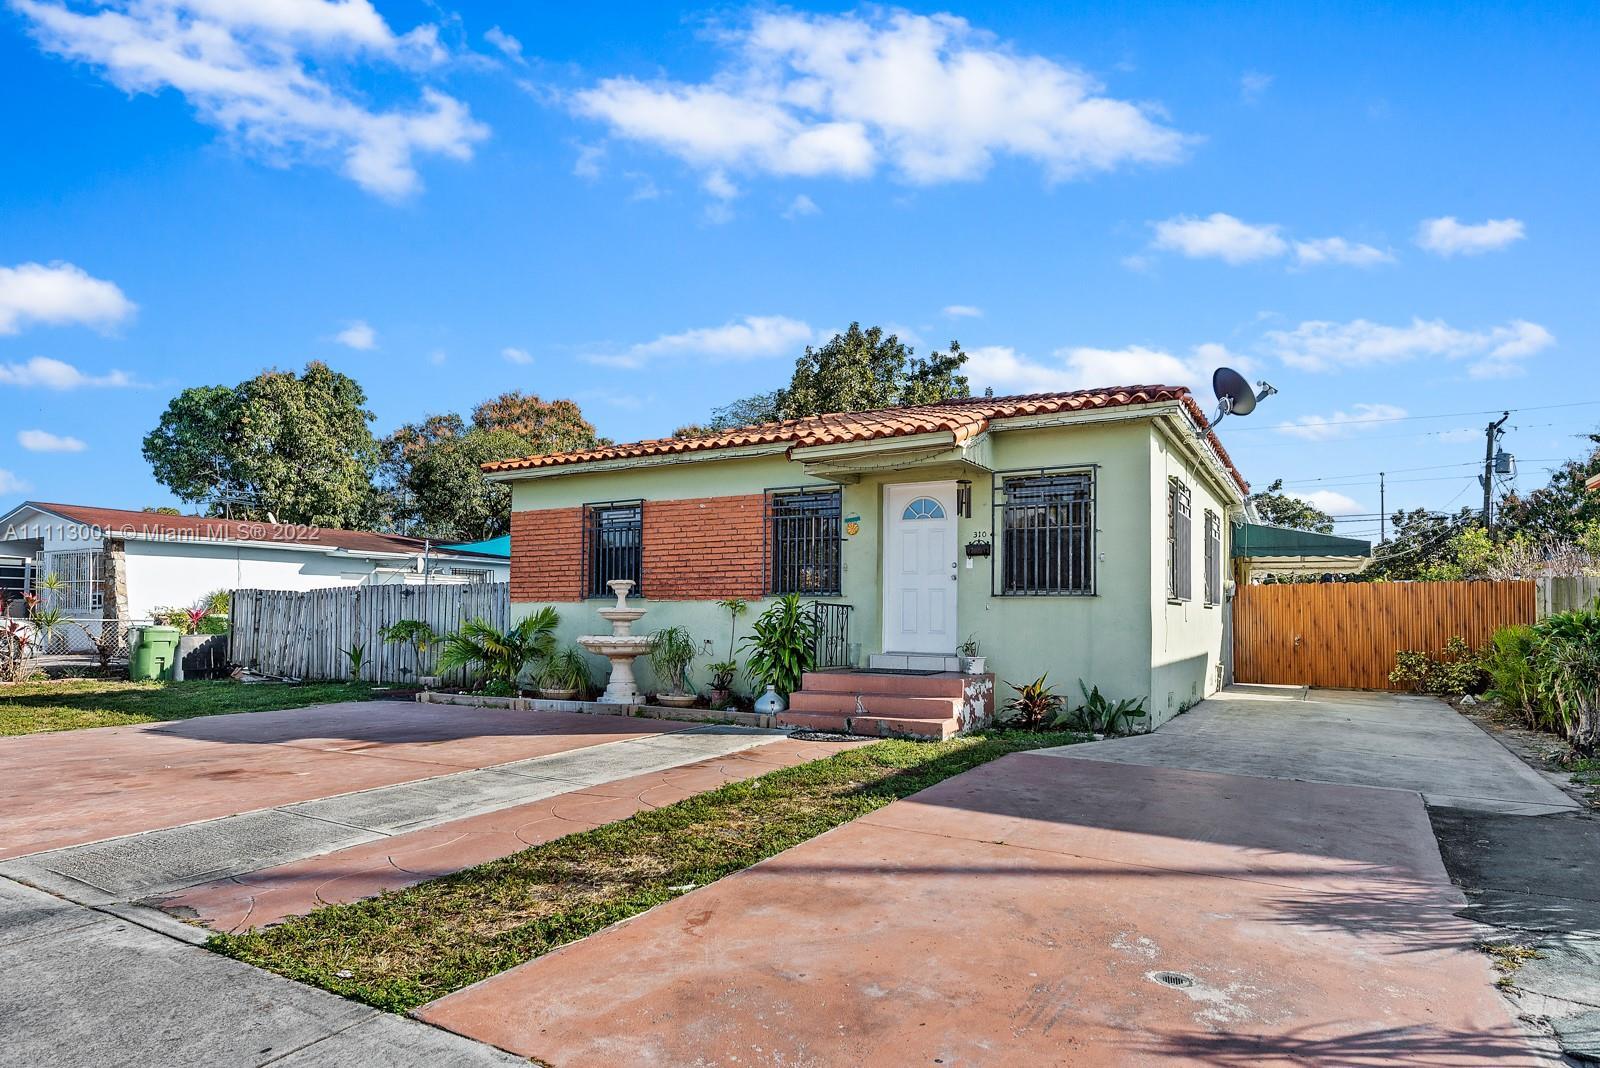 Single Family Home,For Sale,310 E 17th St, Hialeah, Florida 33010,Brickell,realty,broker,condos near me